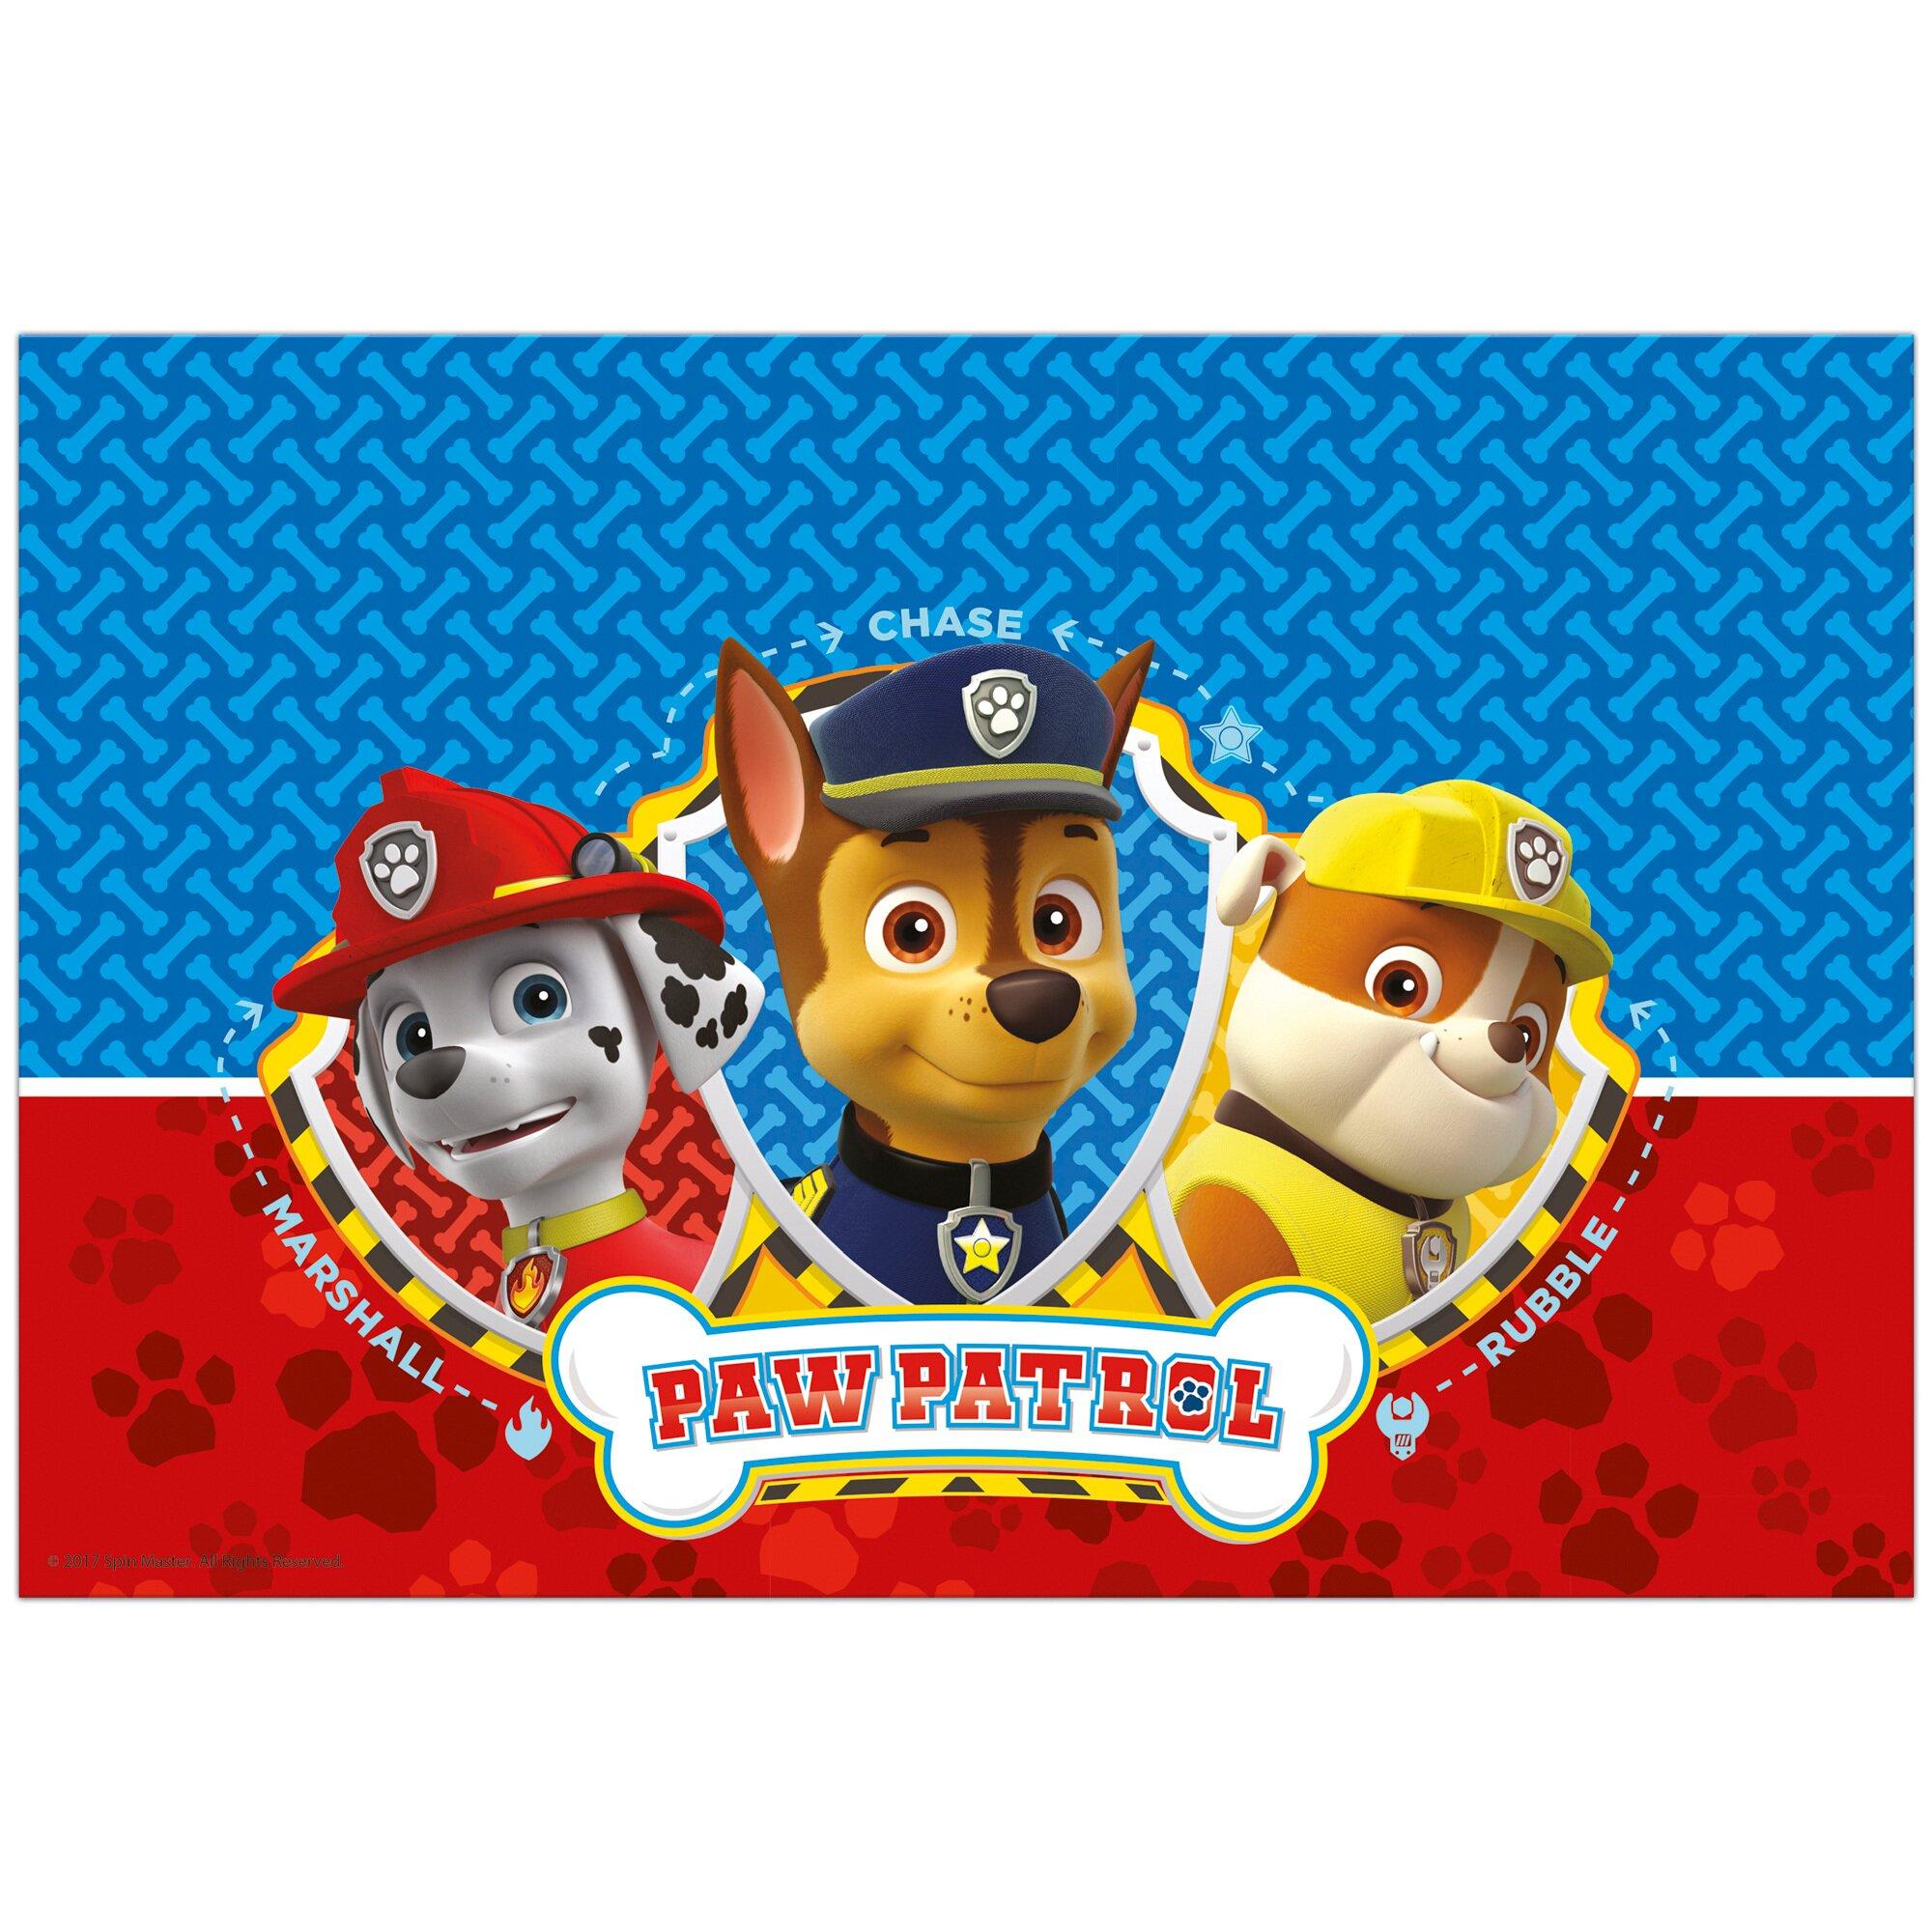 paw-patrol-tischdecke-paw-patrol